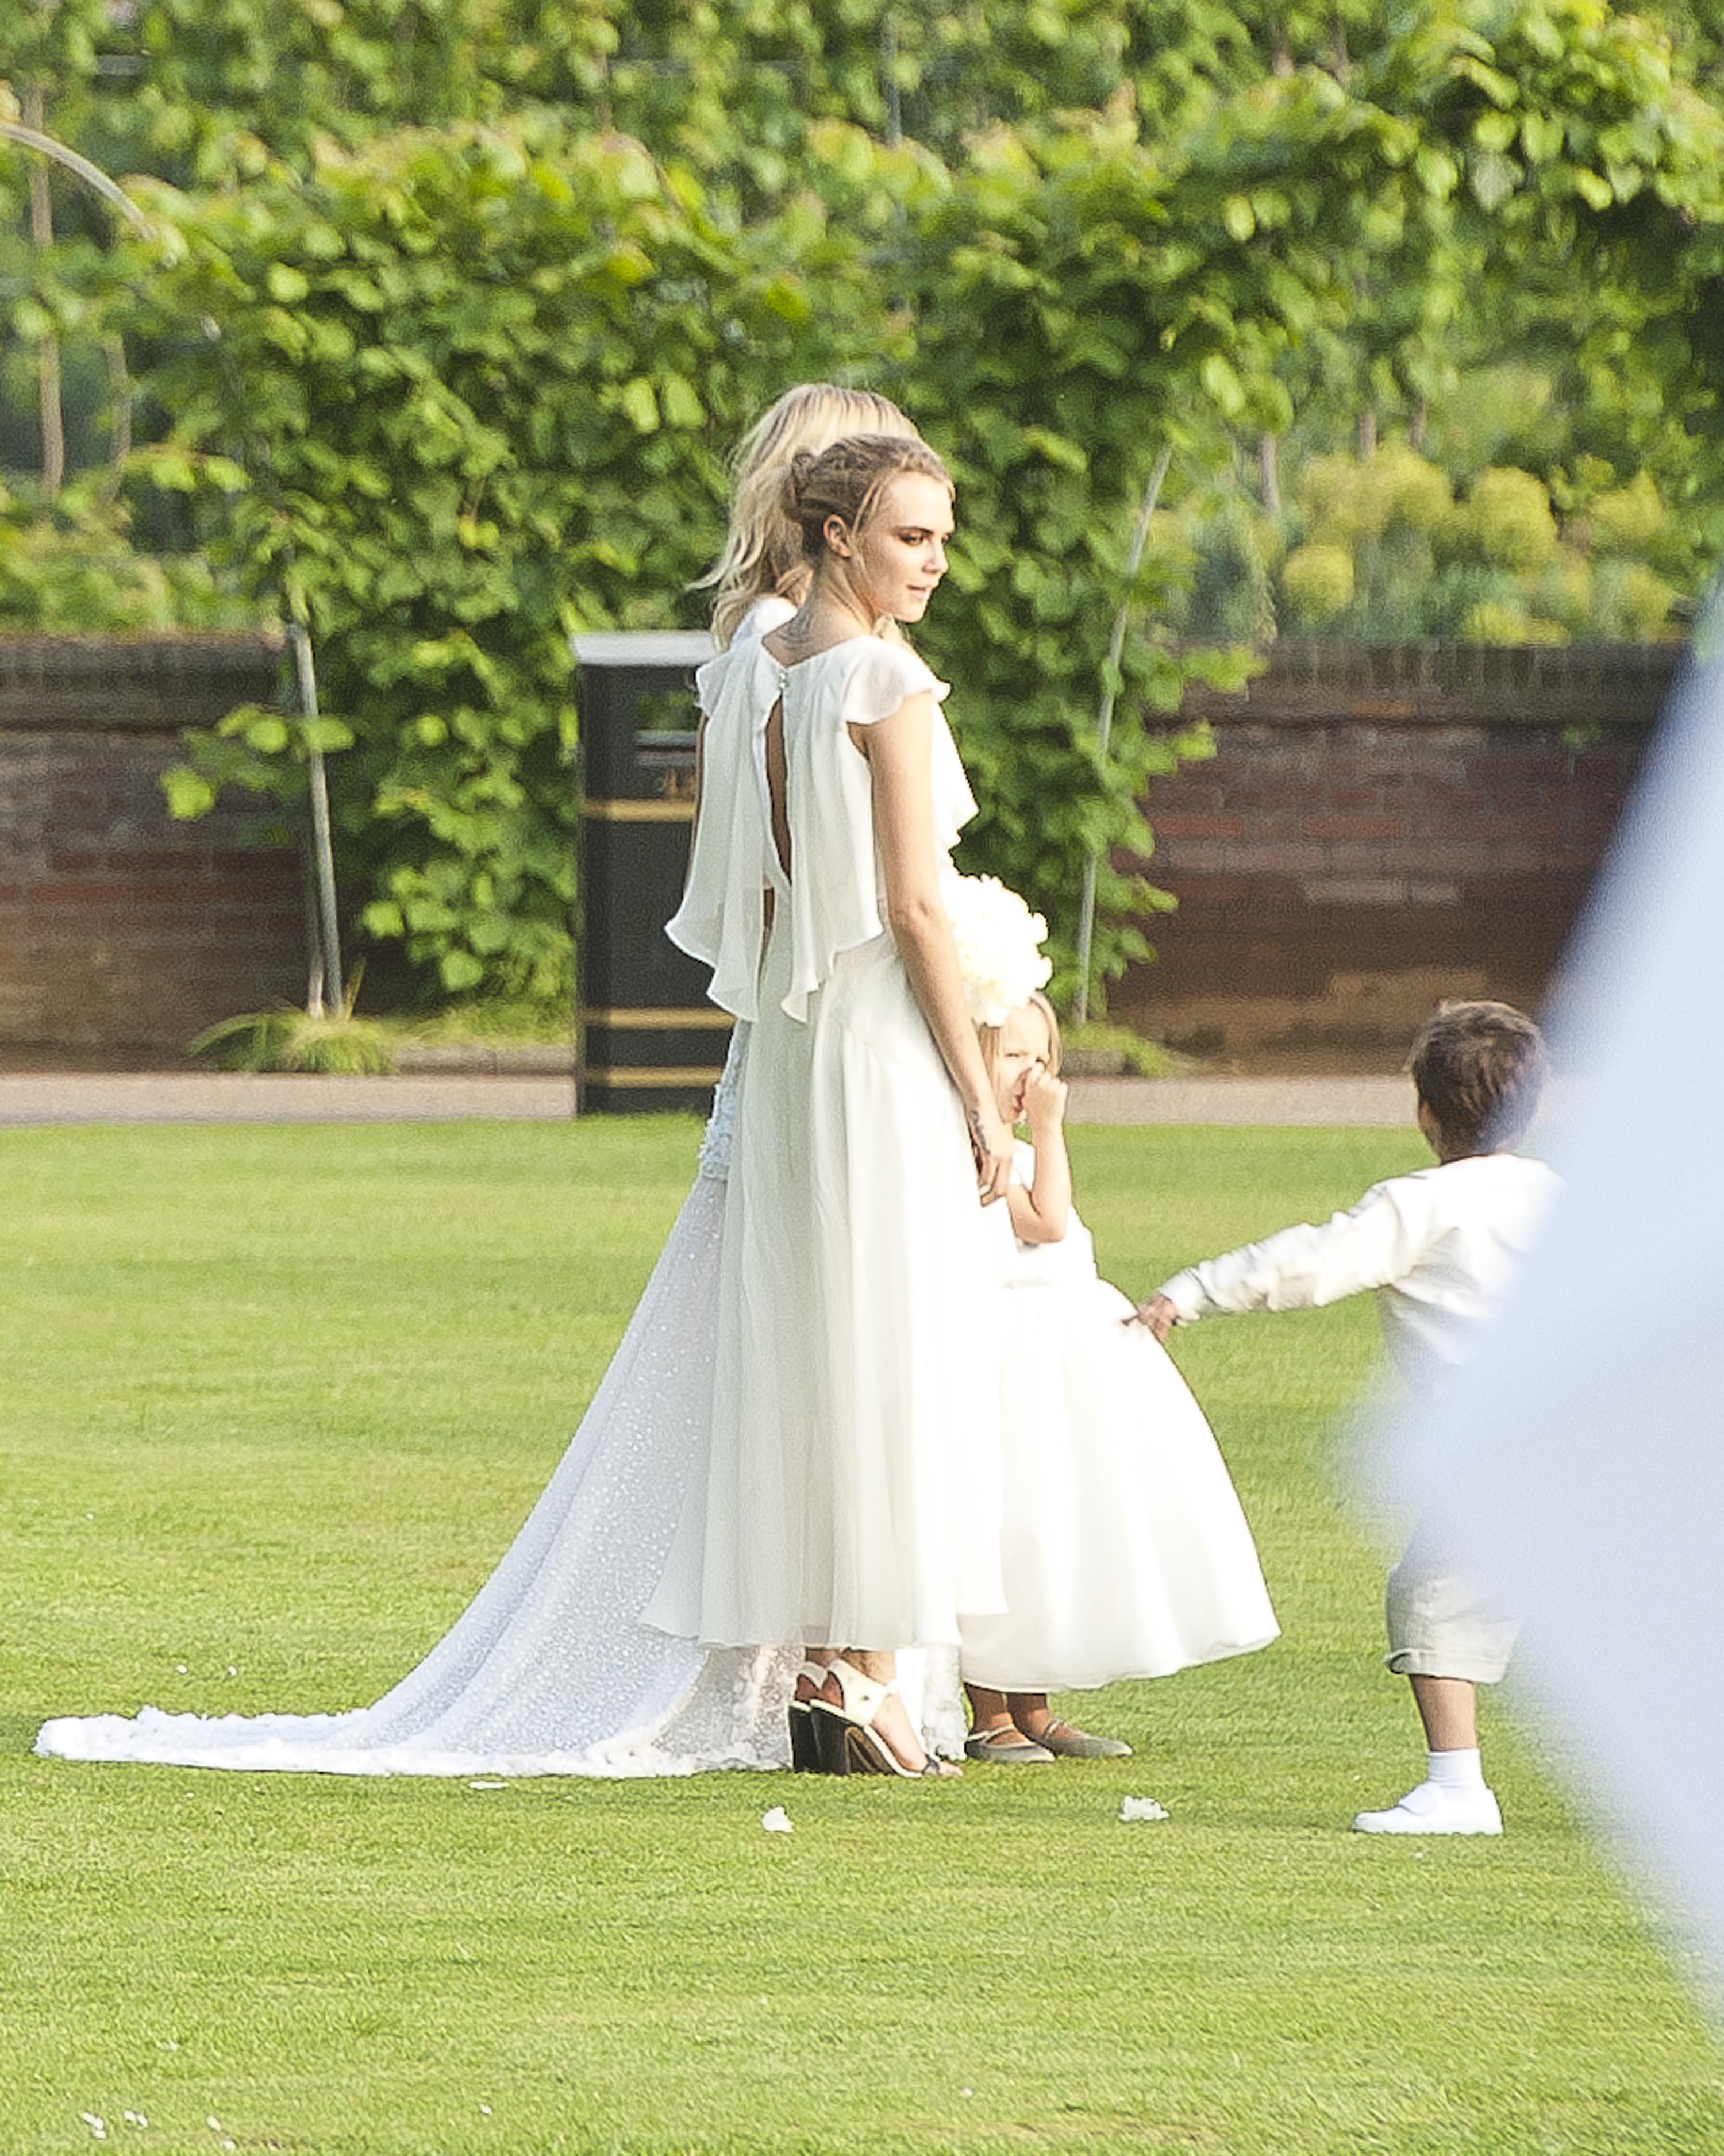 la robe de demoiselle d 39 honneur de cara delevingne au mariage de sa soeur poppy delevingne les. Black Bedroom Furniture Sets. Home Design Ideas